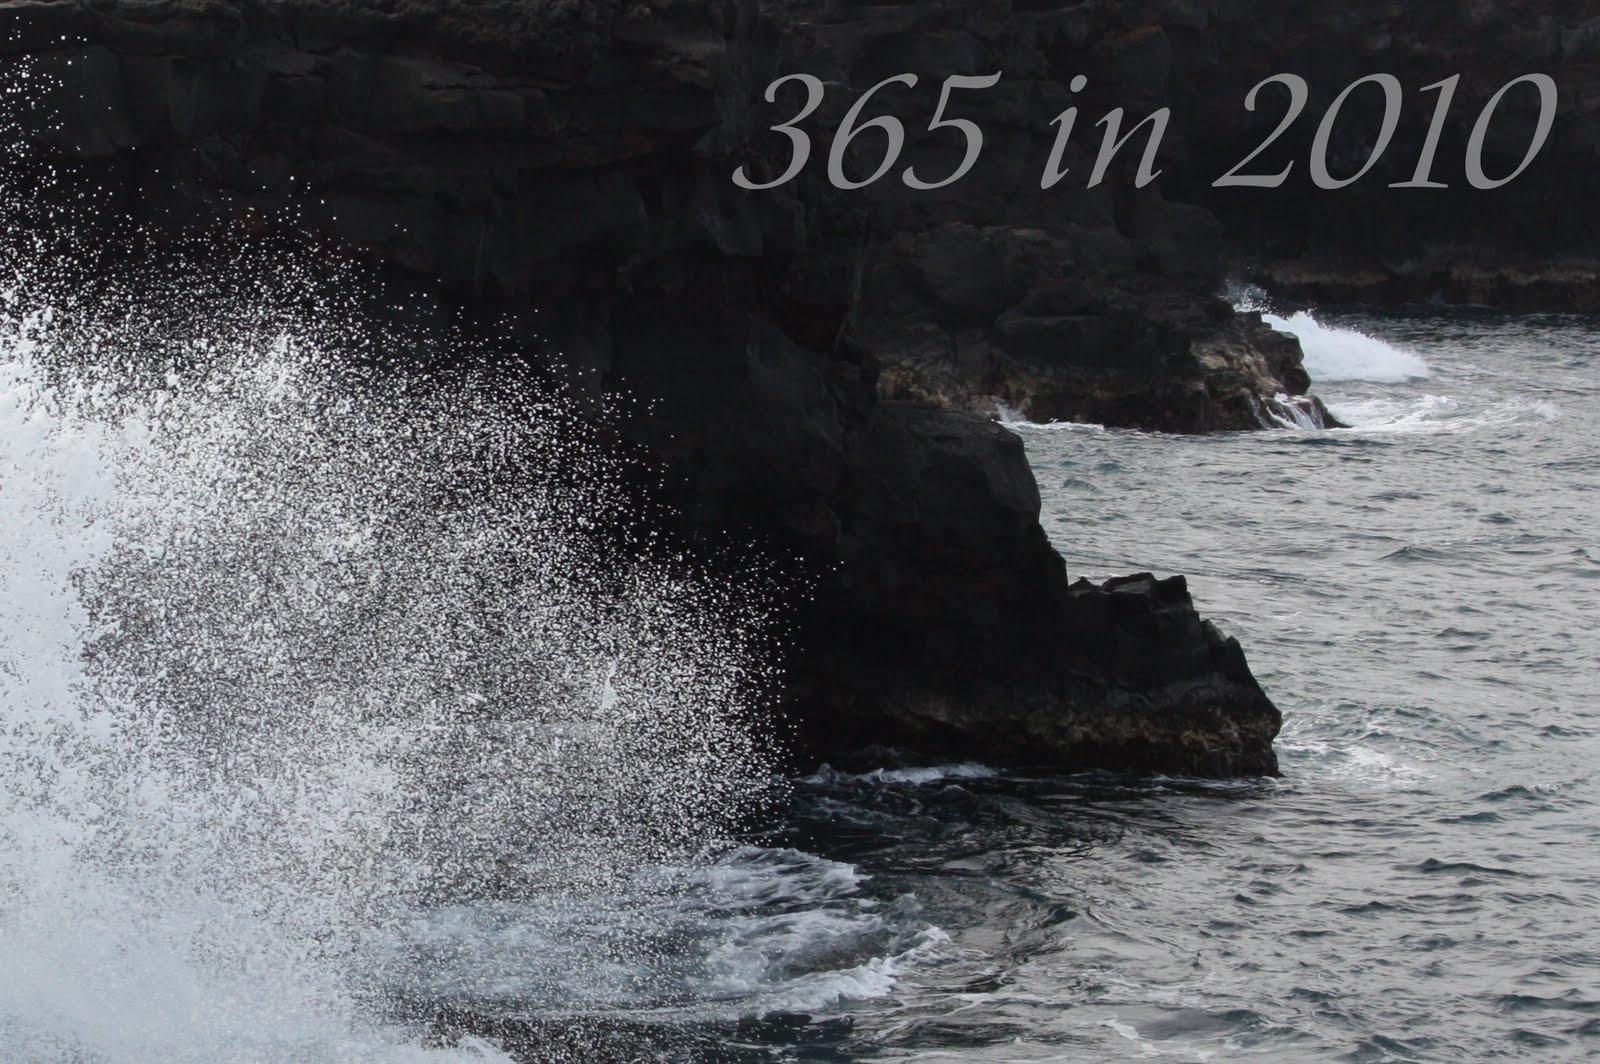 365 in 2010